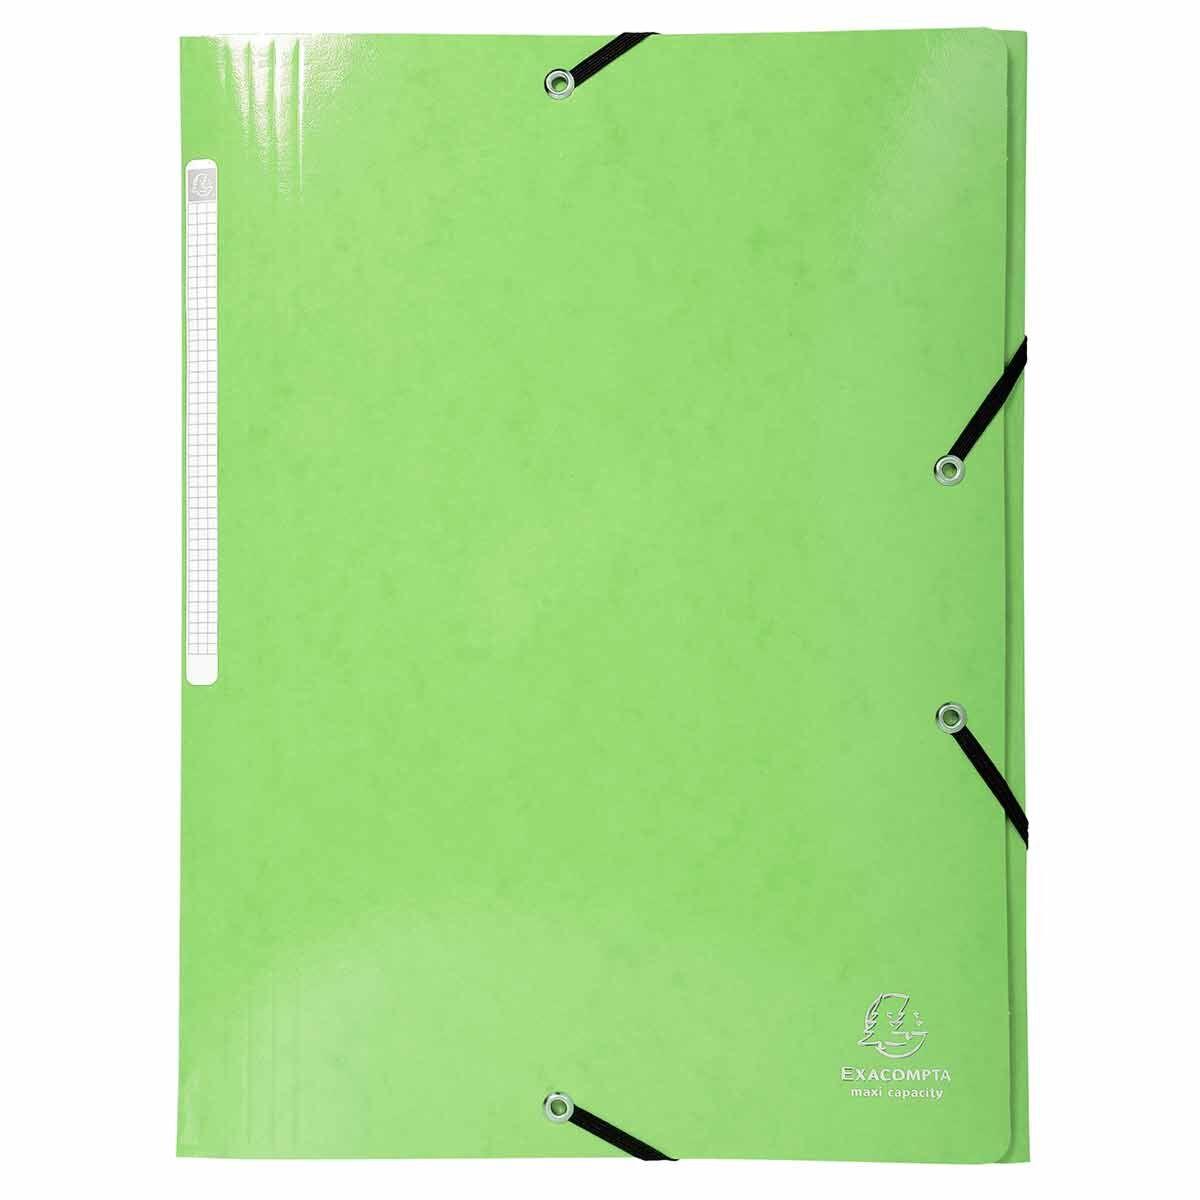 Exacompta Iderama Elasticated 3 Flap Folder Maxi Capacity 600gsm Pack of 25